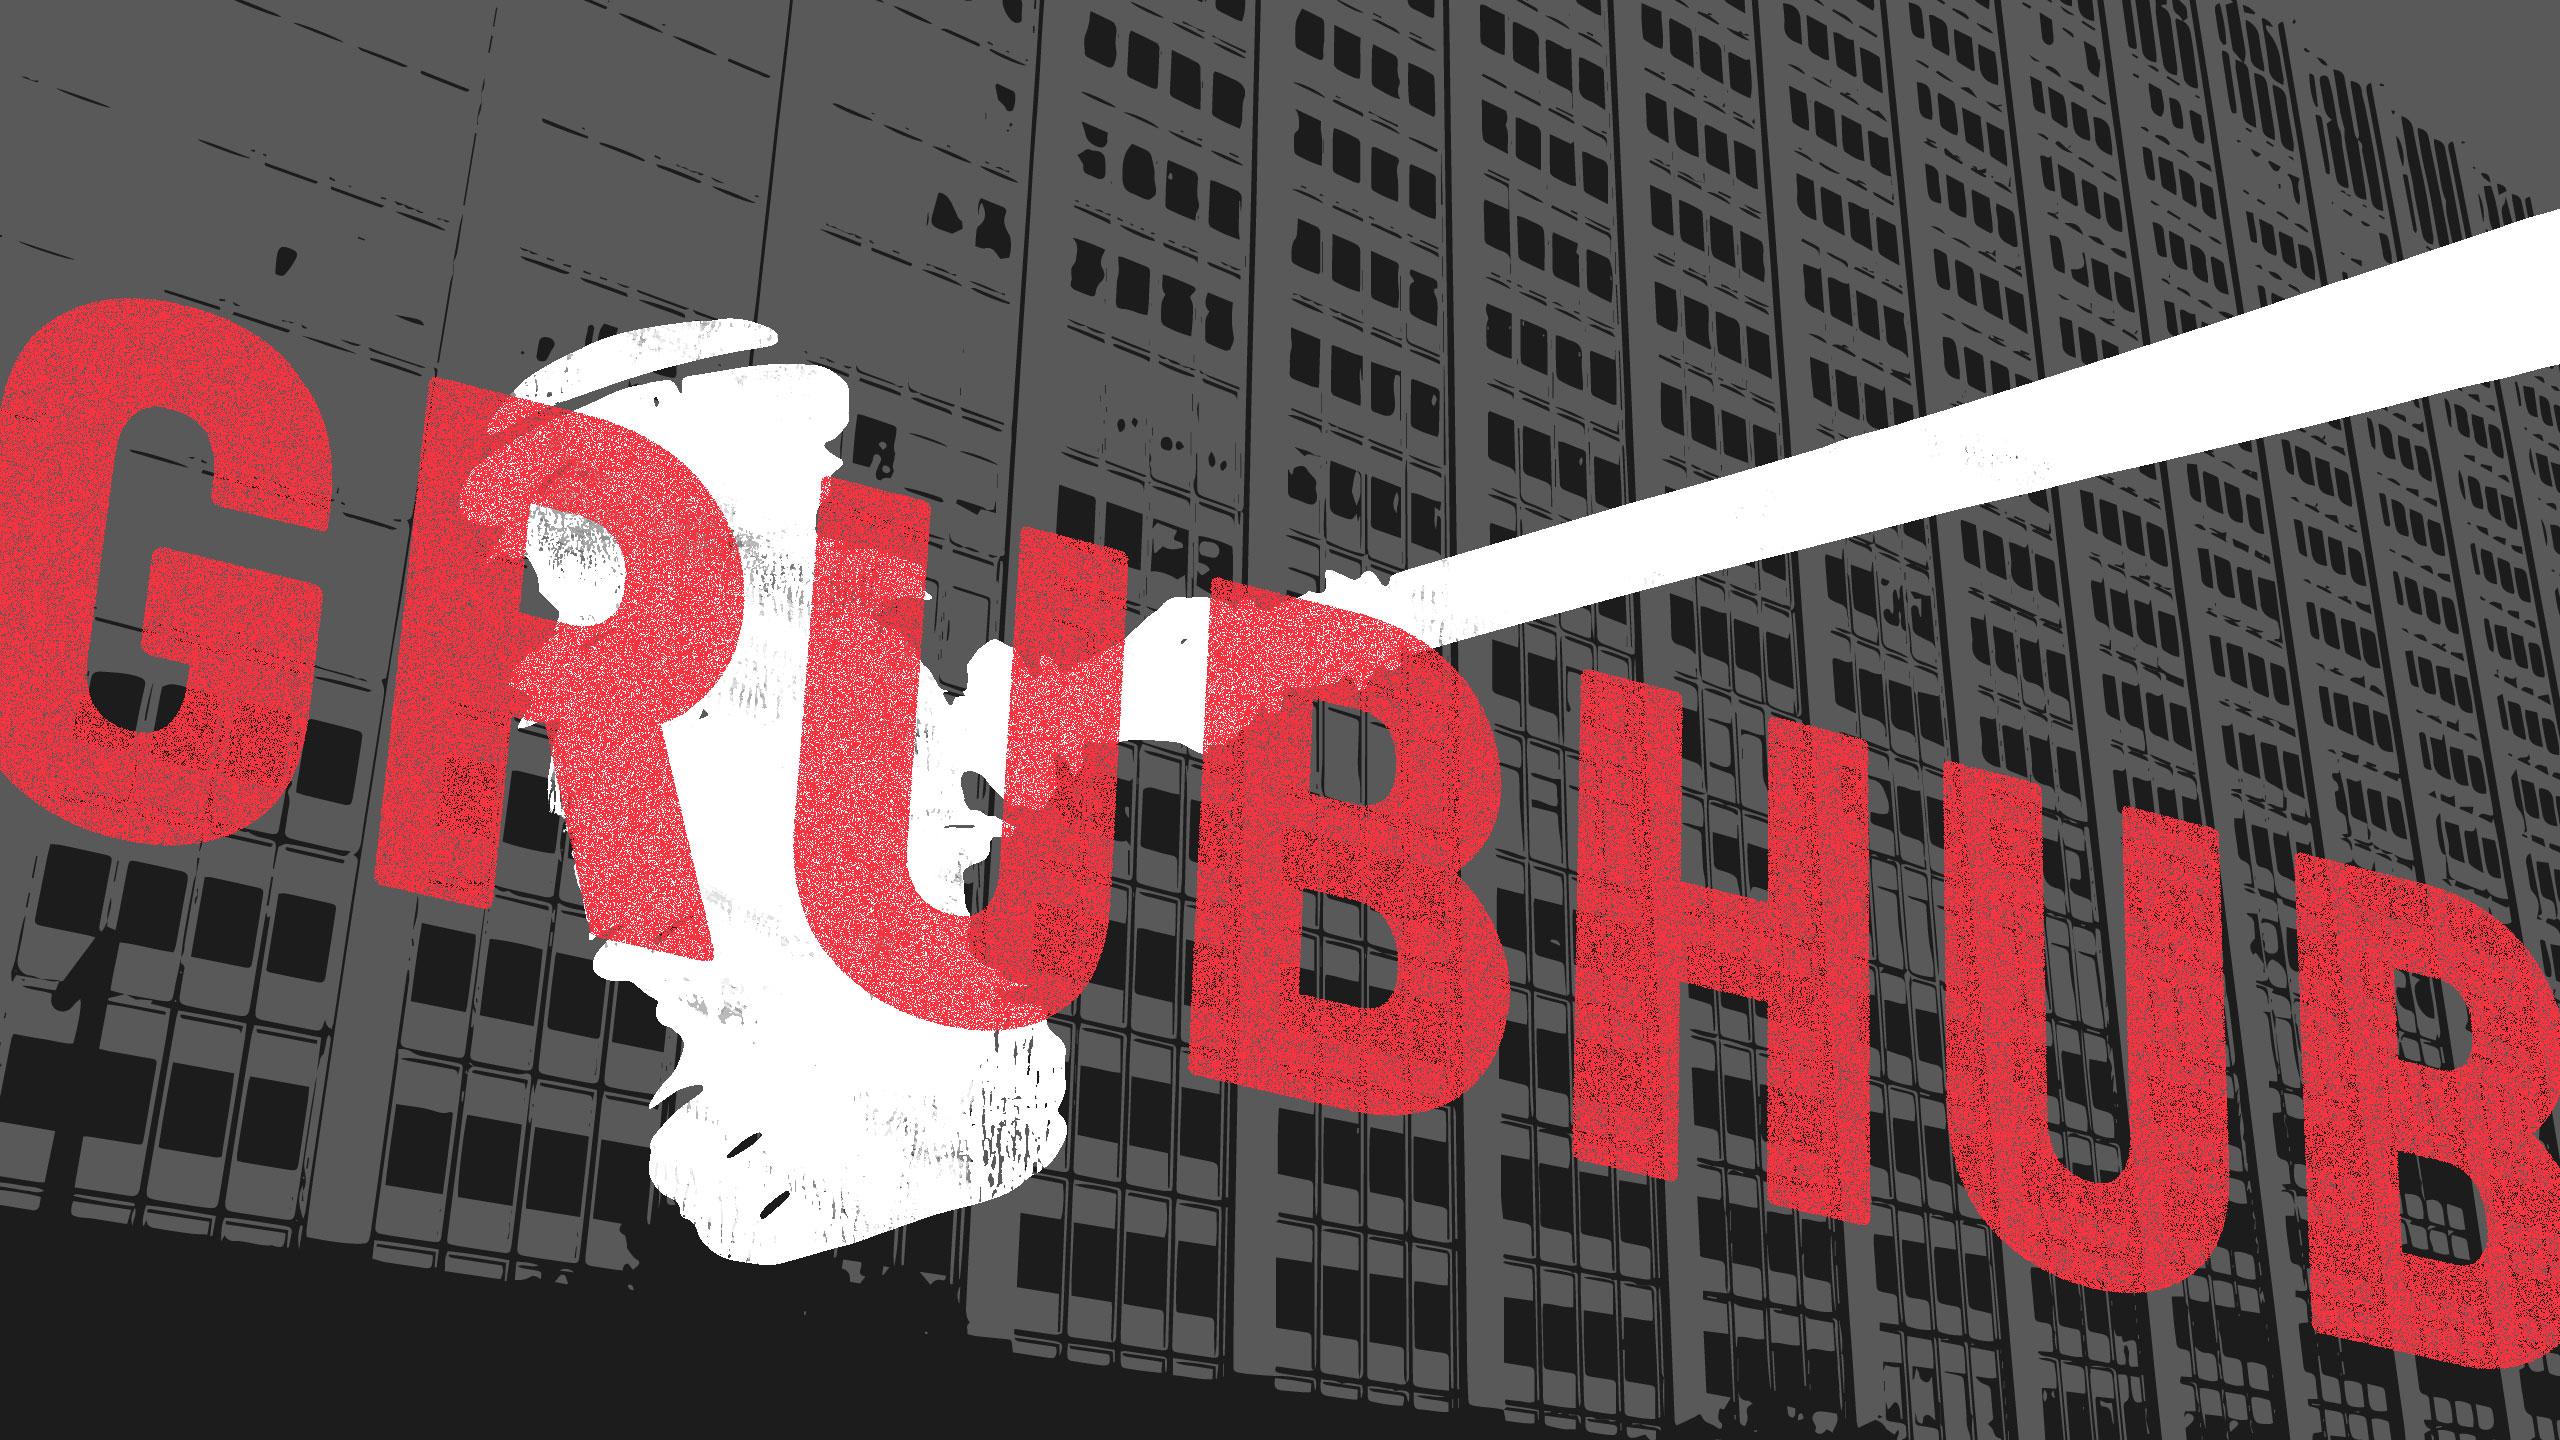 Work for grubhub